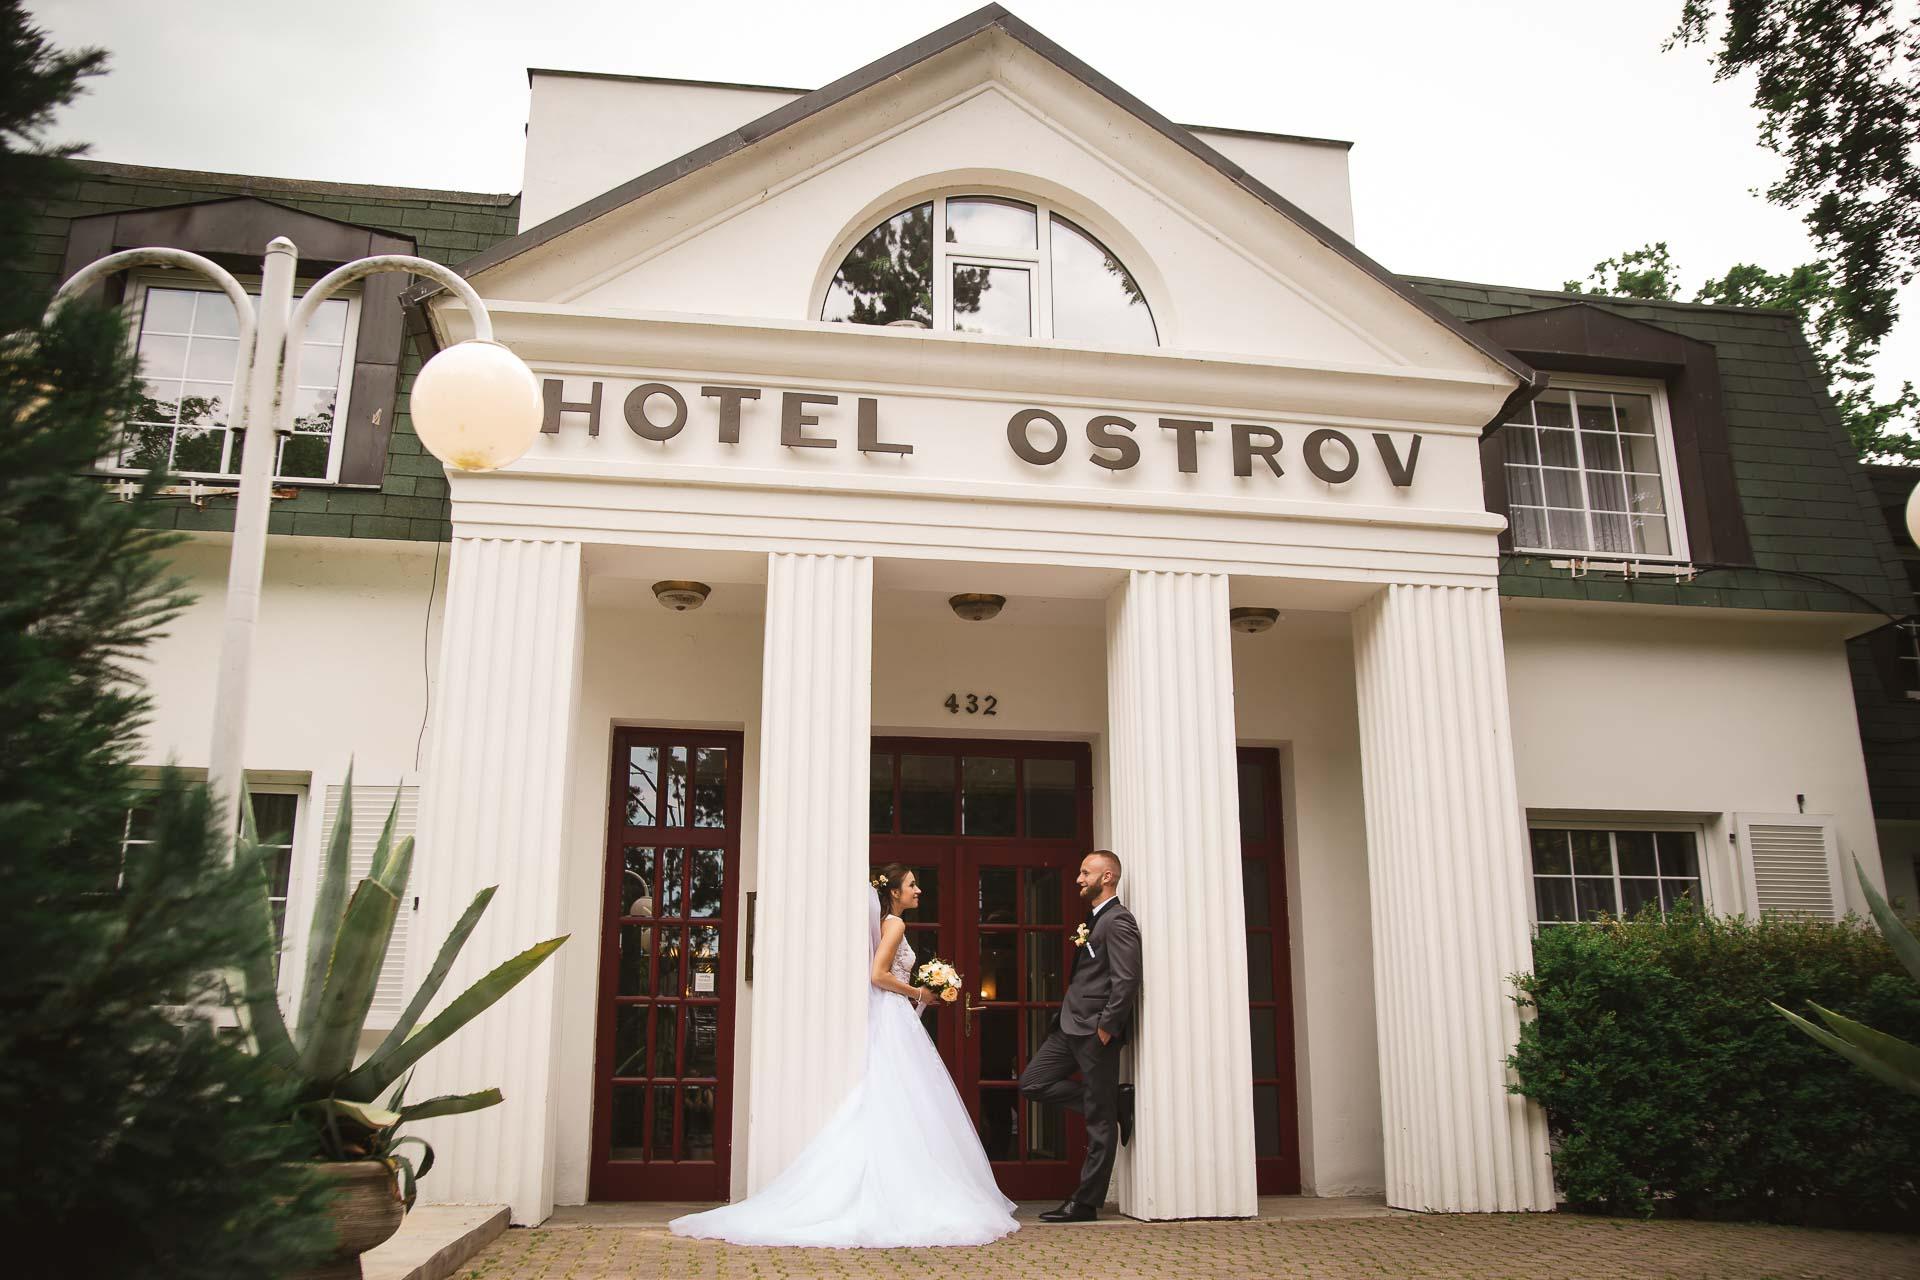 svatební-fotograf-svatebni-video-Nymburk-hotel-Ostrov-Beautyfoto-6103